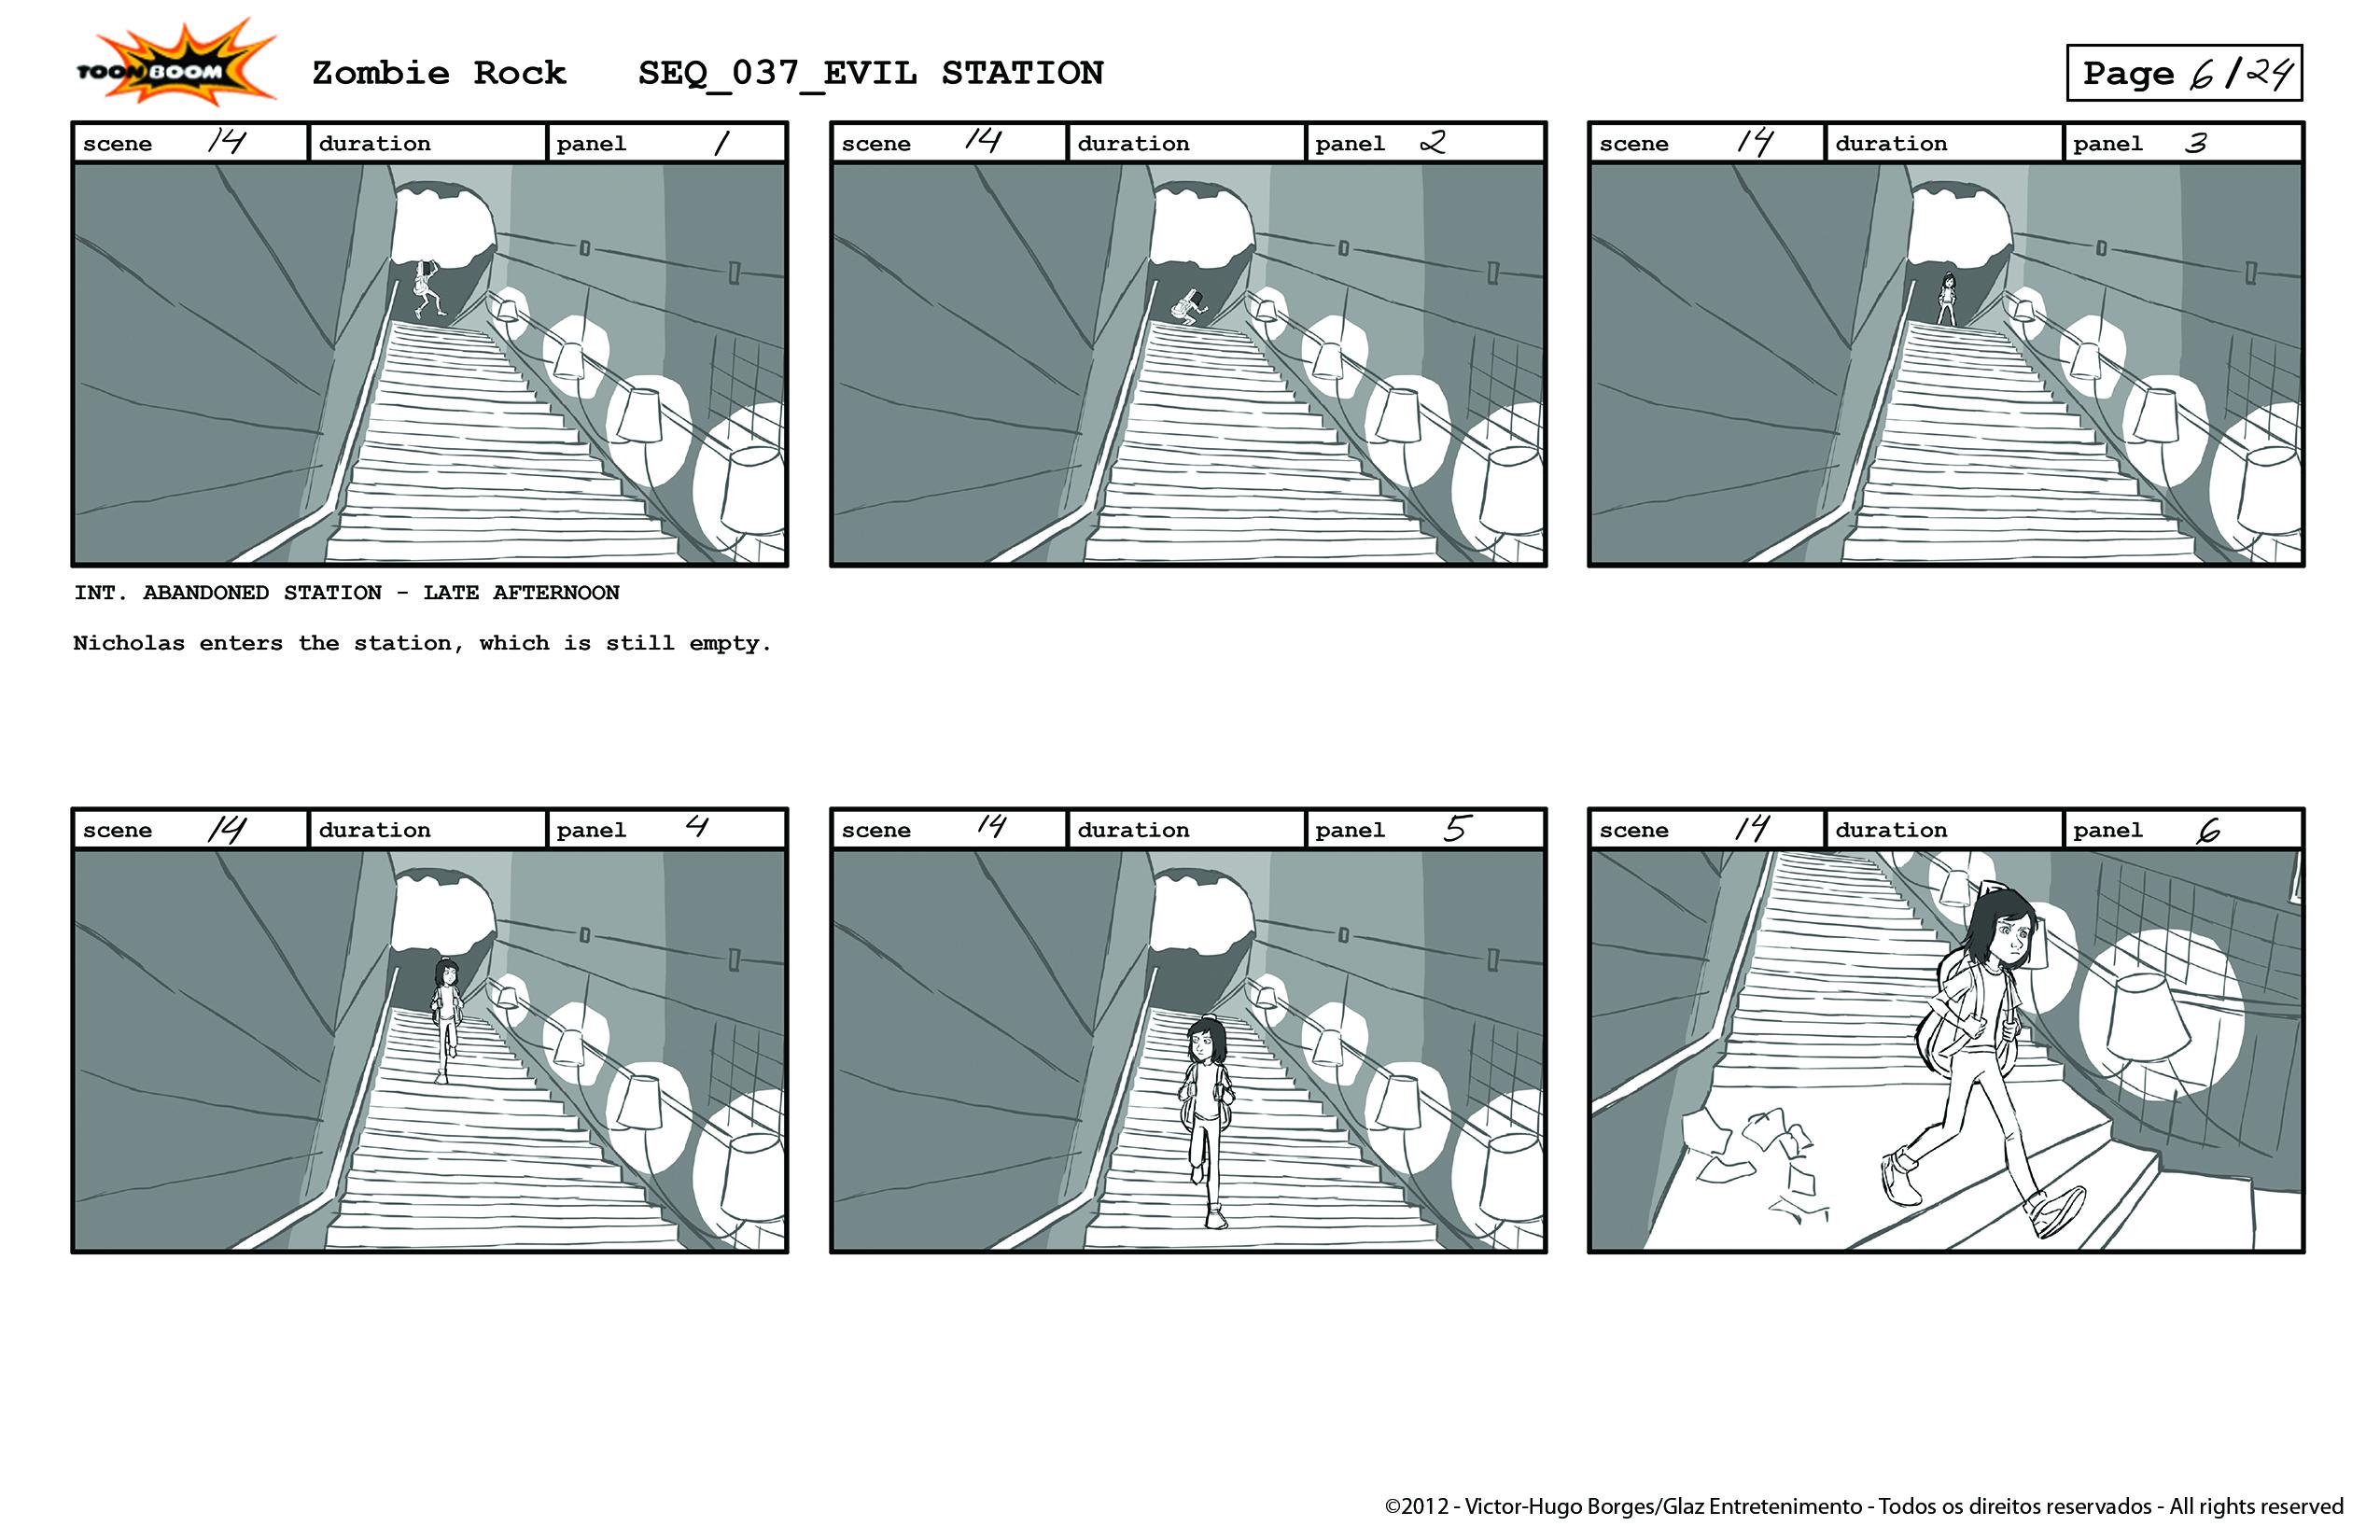 SEQ037_Evil Station_page06